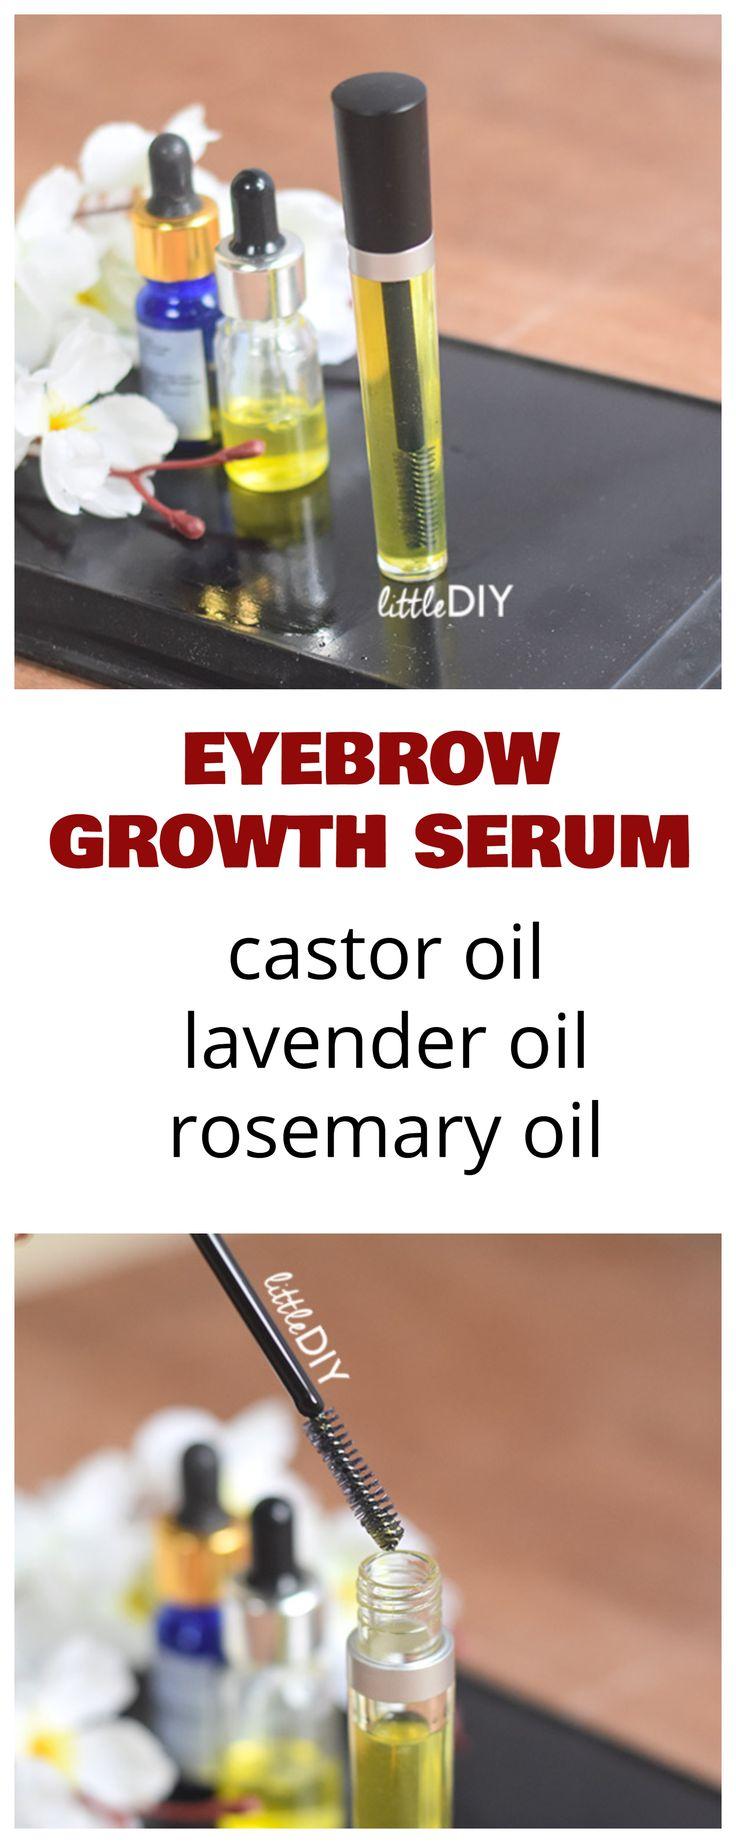 Diy lavender eyebrow growth serum eyebrow growth